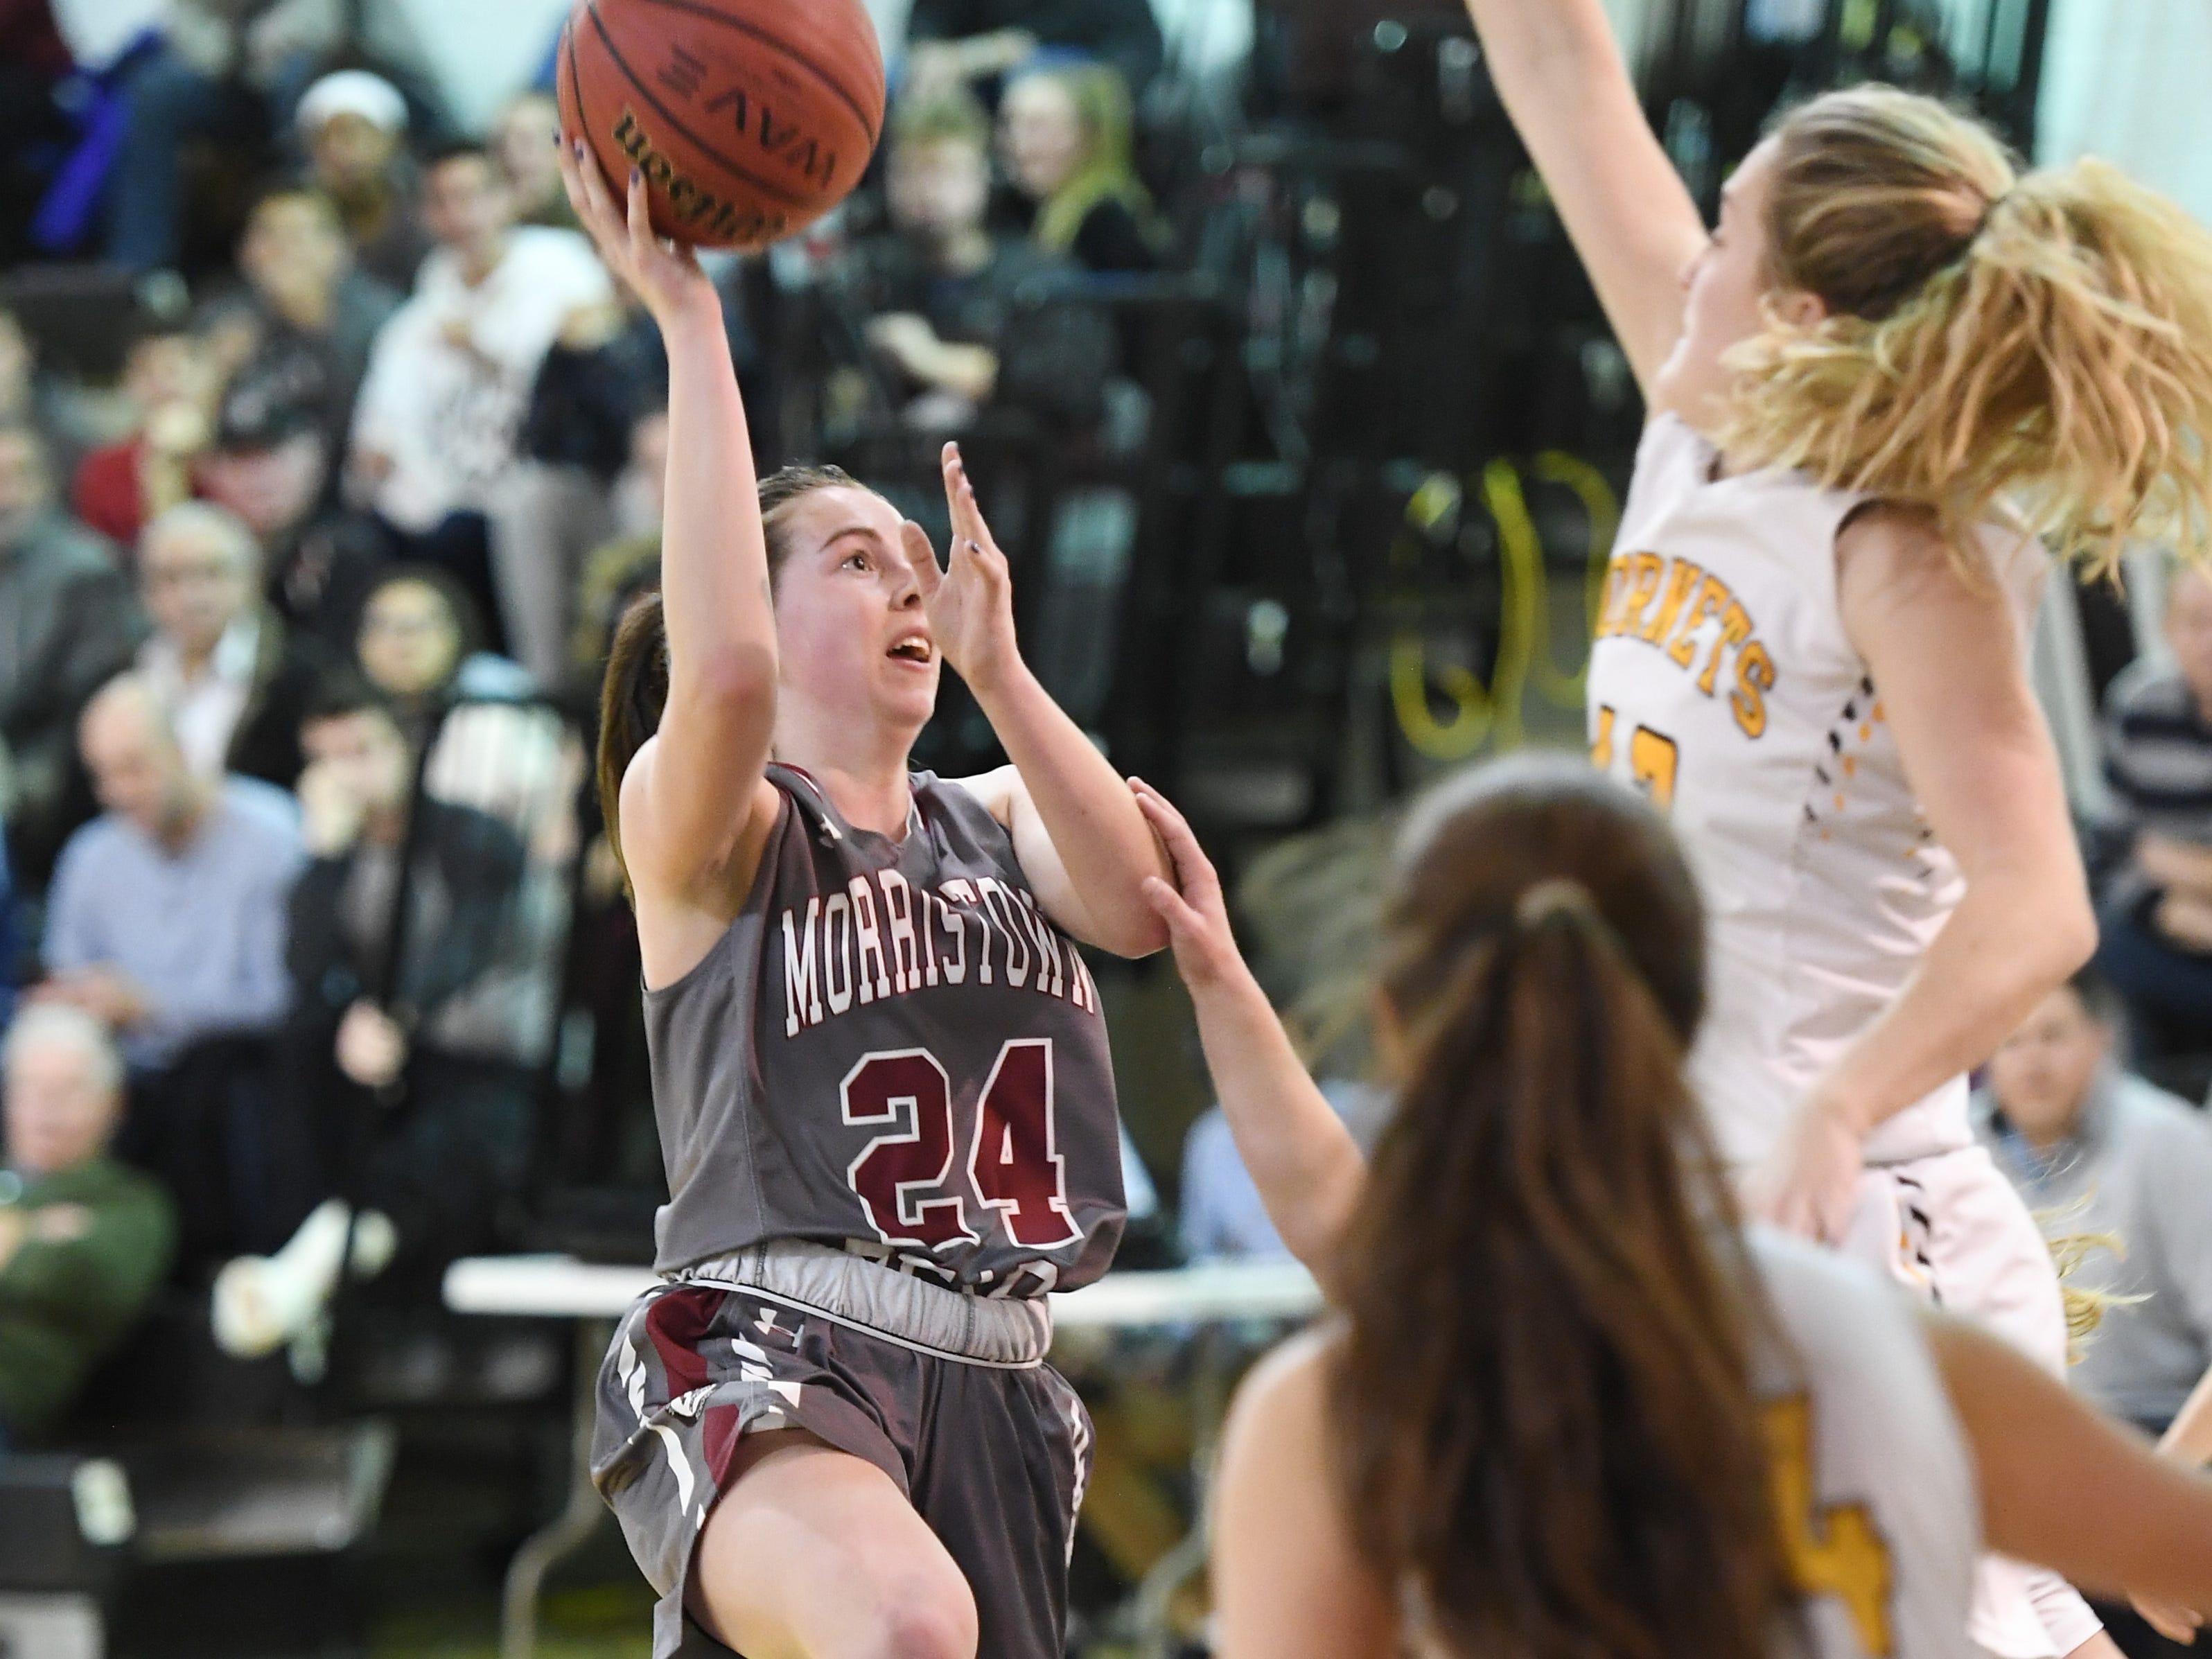 Morristown-Beard girls basketball at Hanover Park on Friday, January 4, 2019. MB #24 Bridget Monaghan drives to the basket.